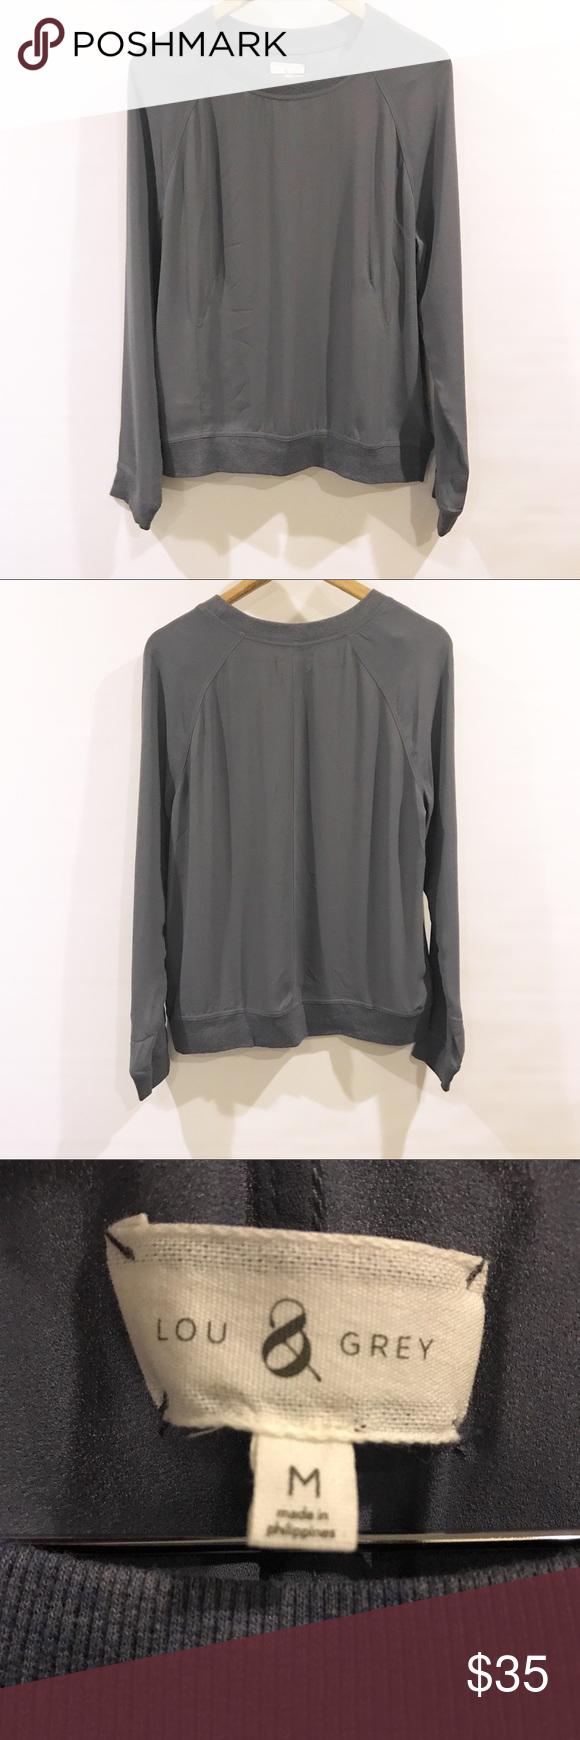 Lou Grey Charcoal Grey Flowy Blouse Size M My Posh Closet